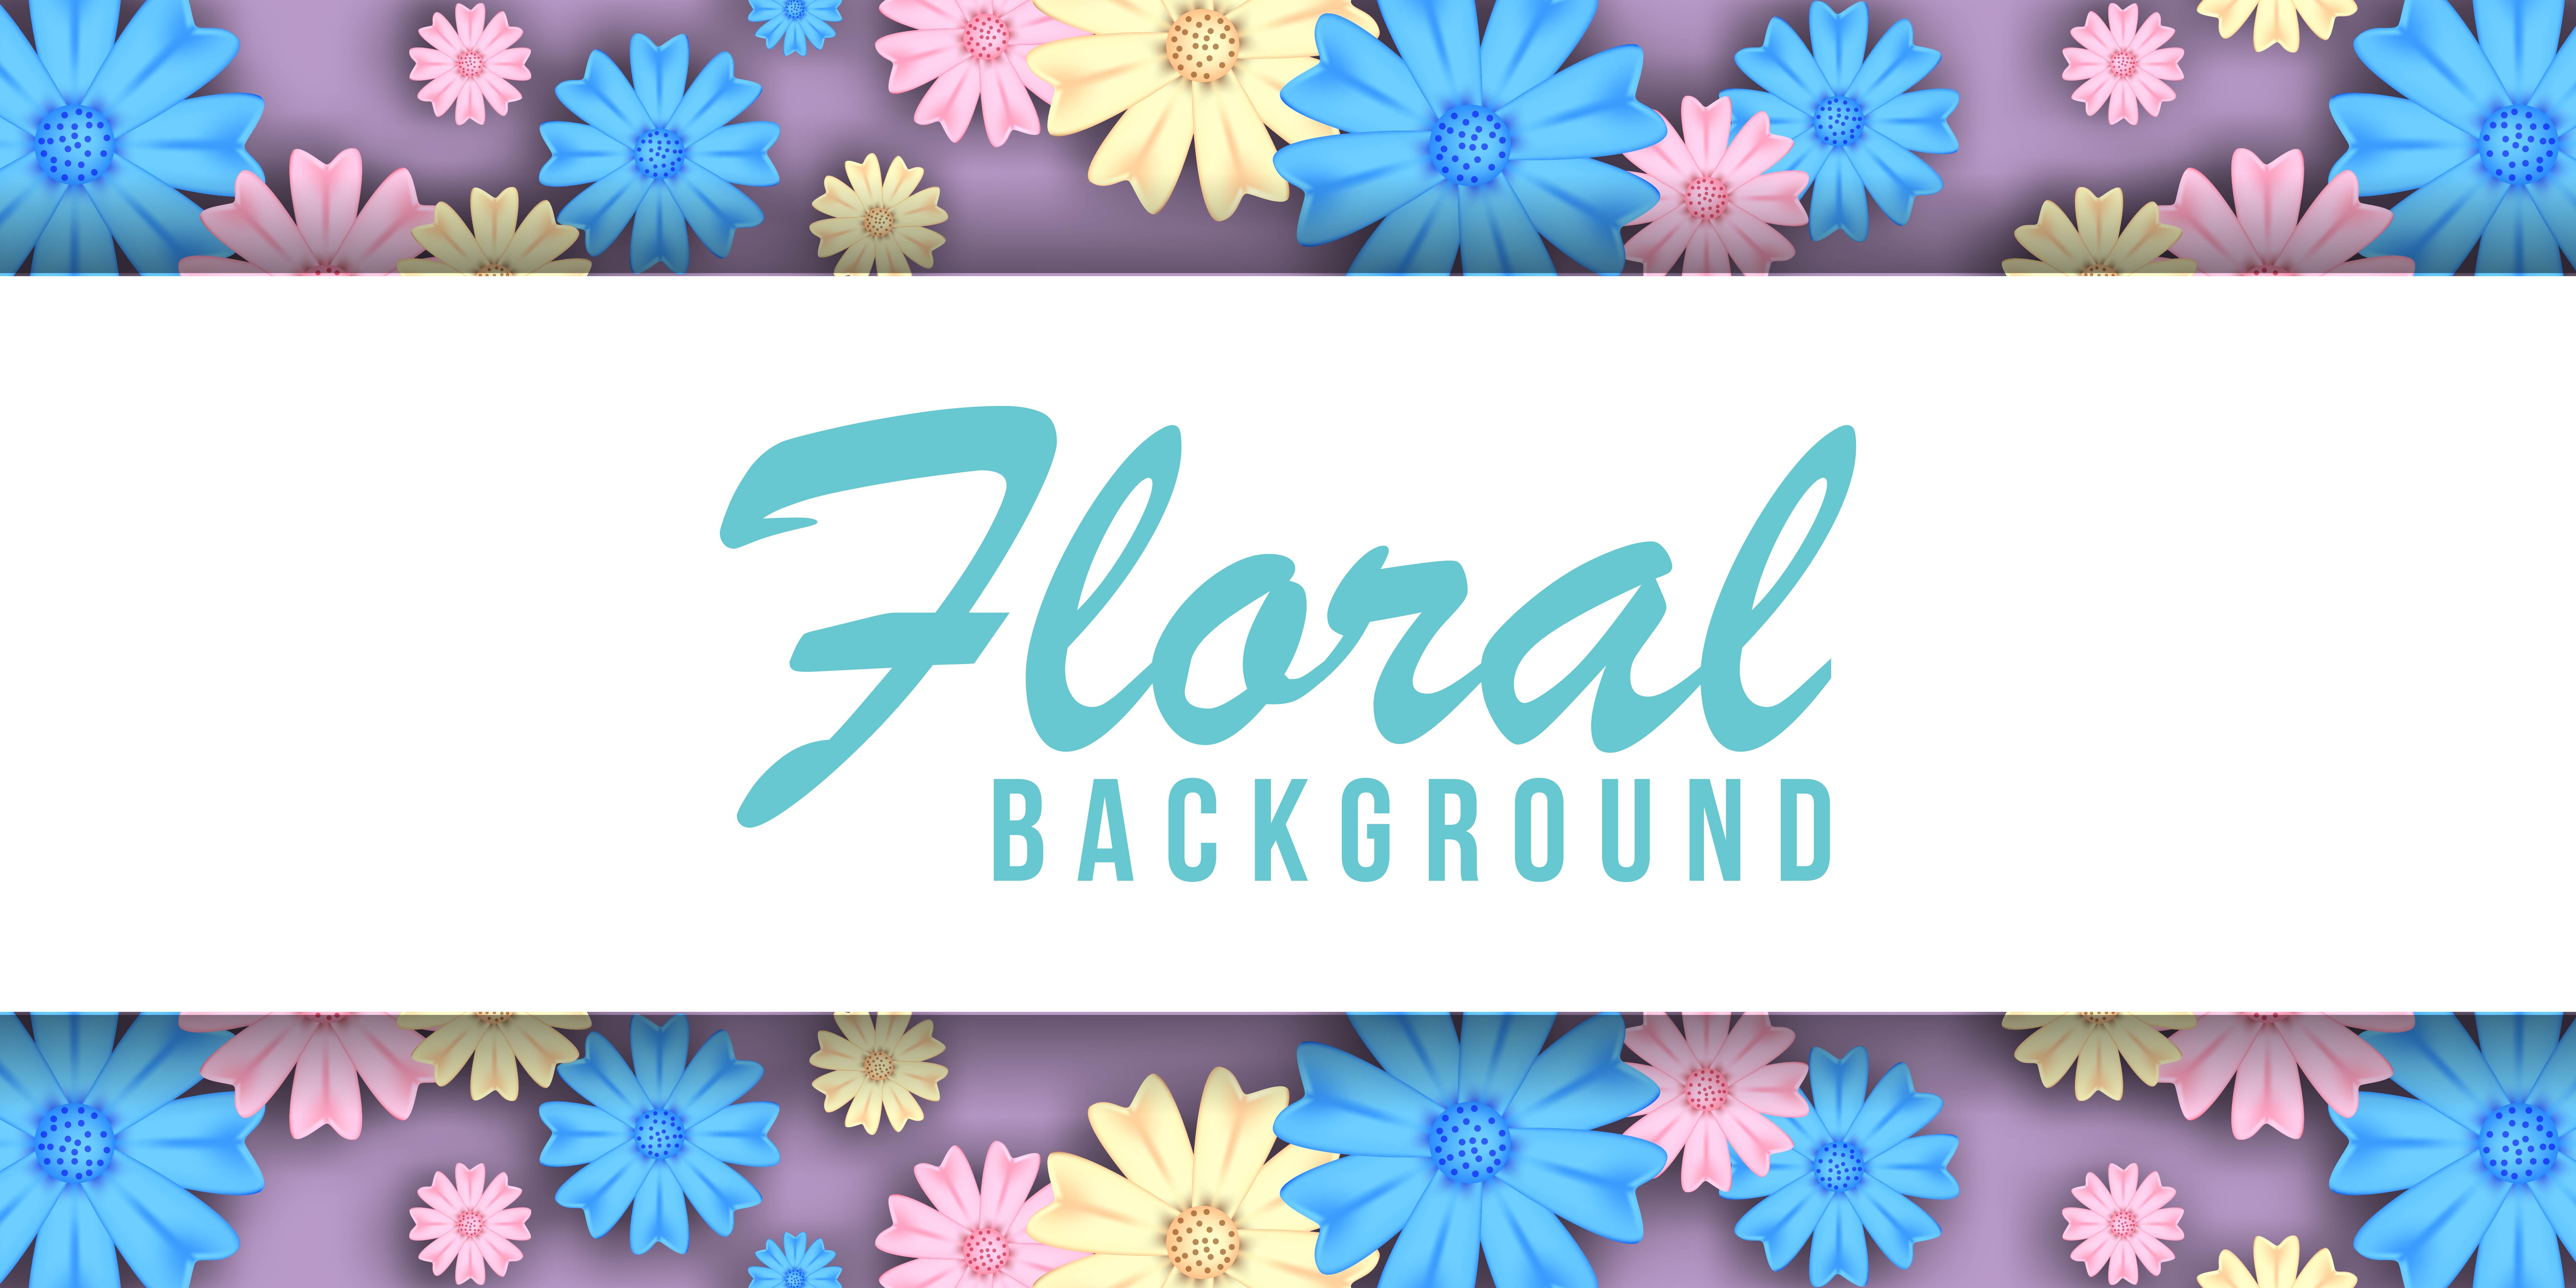 Pastel Floral Background Banner Download Free Vectors Clipart